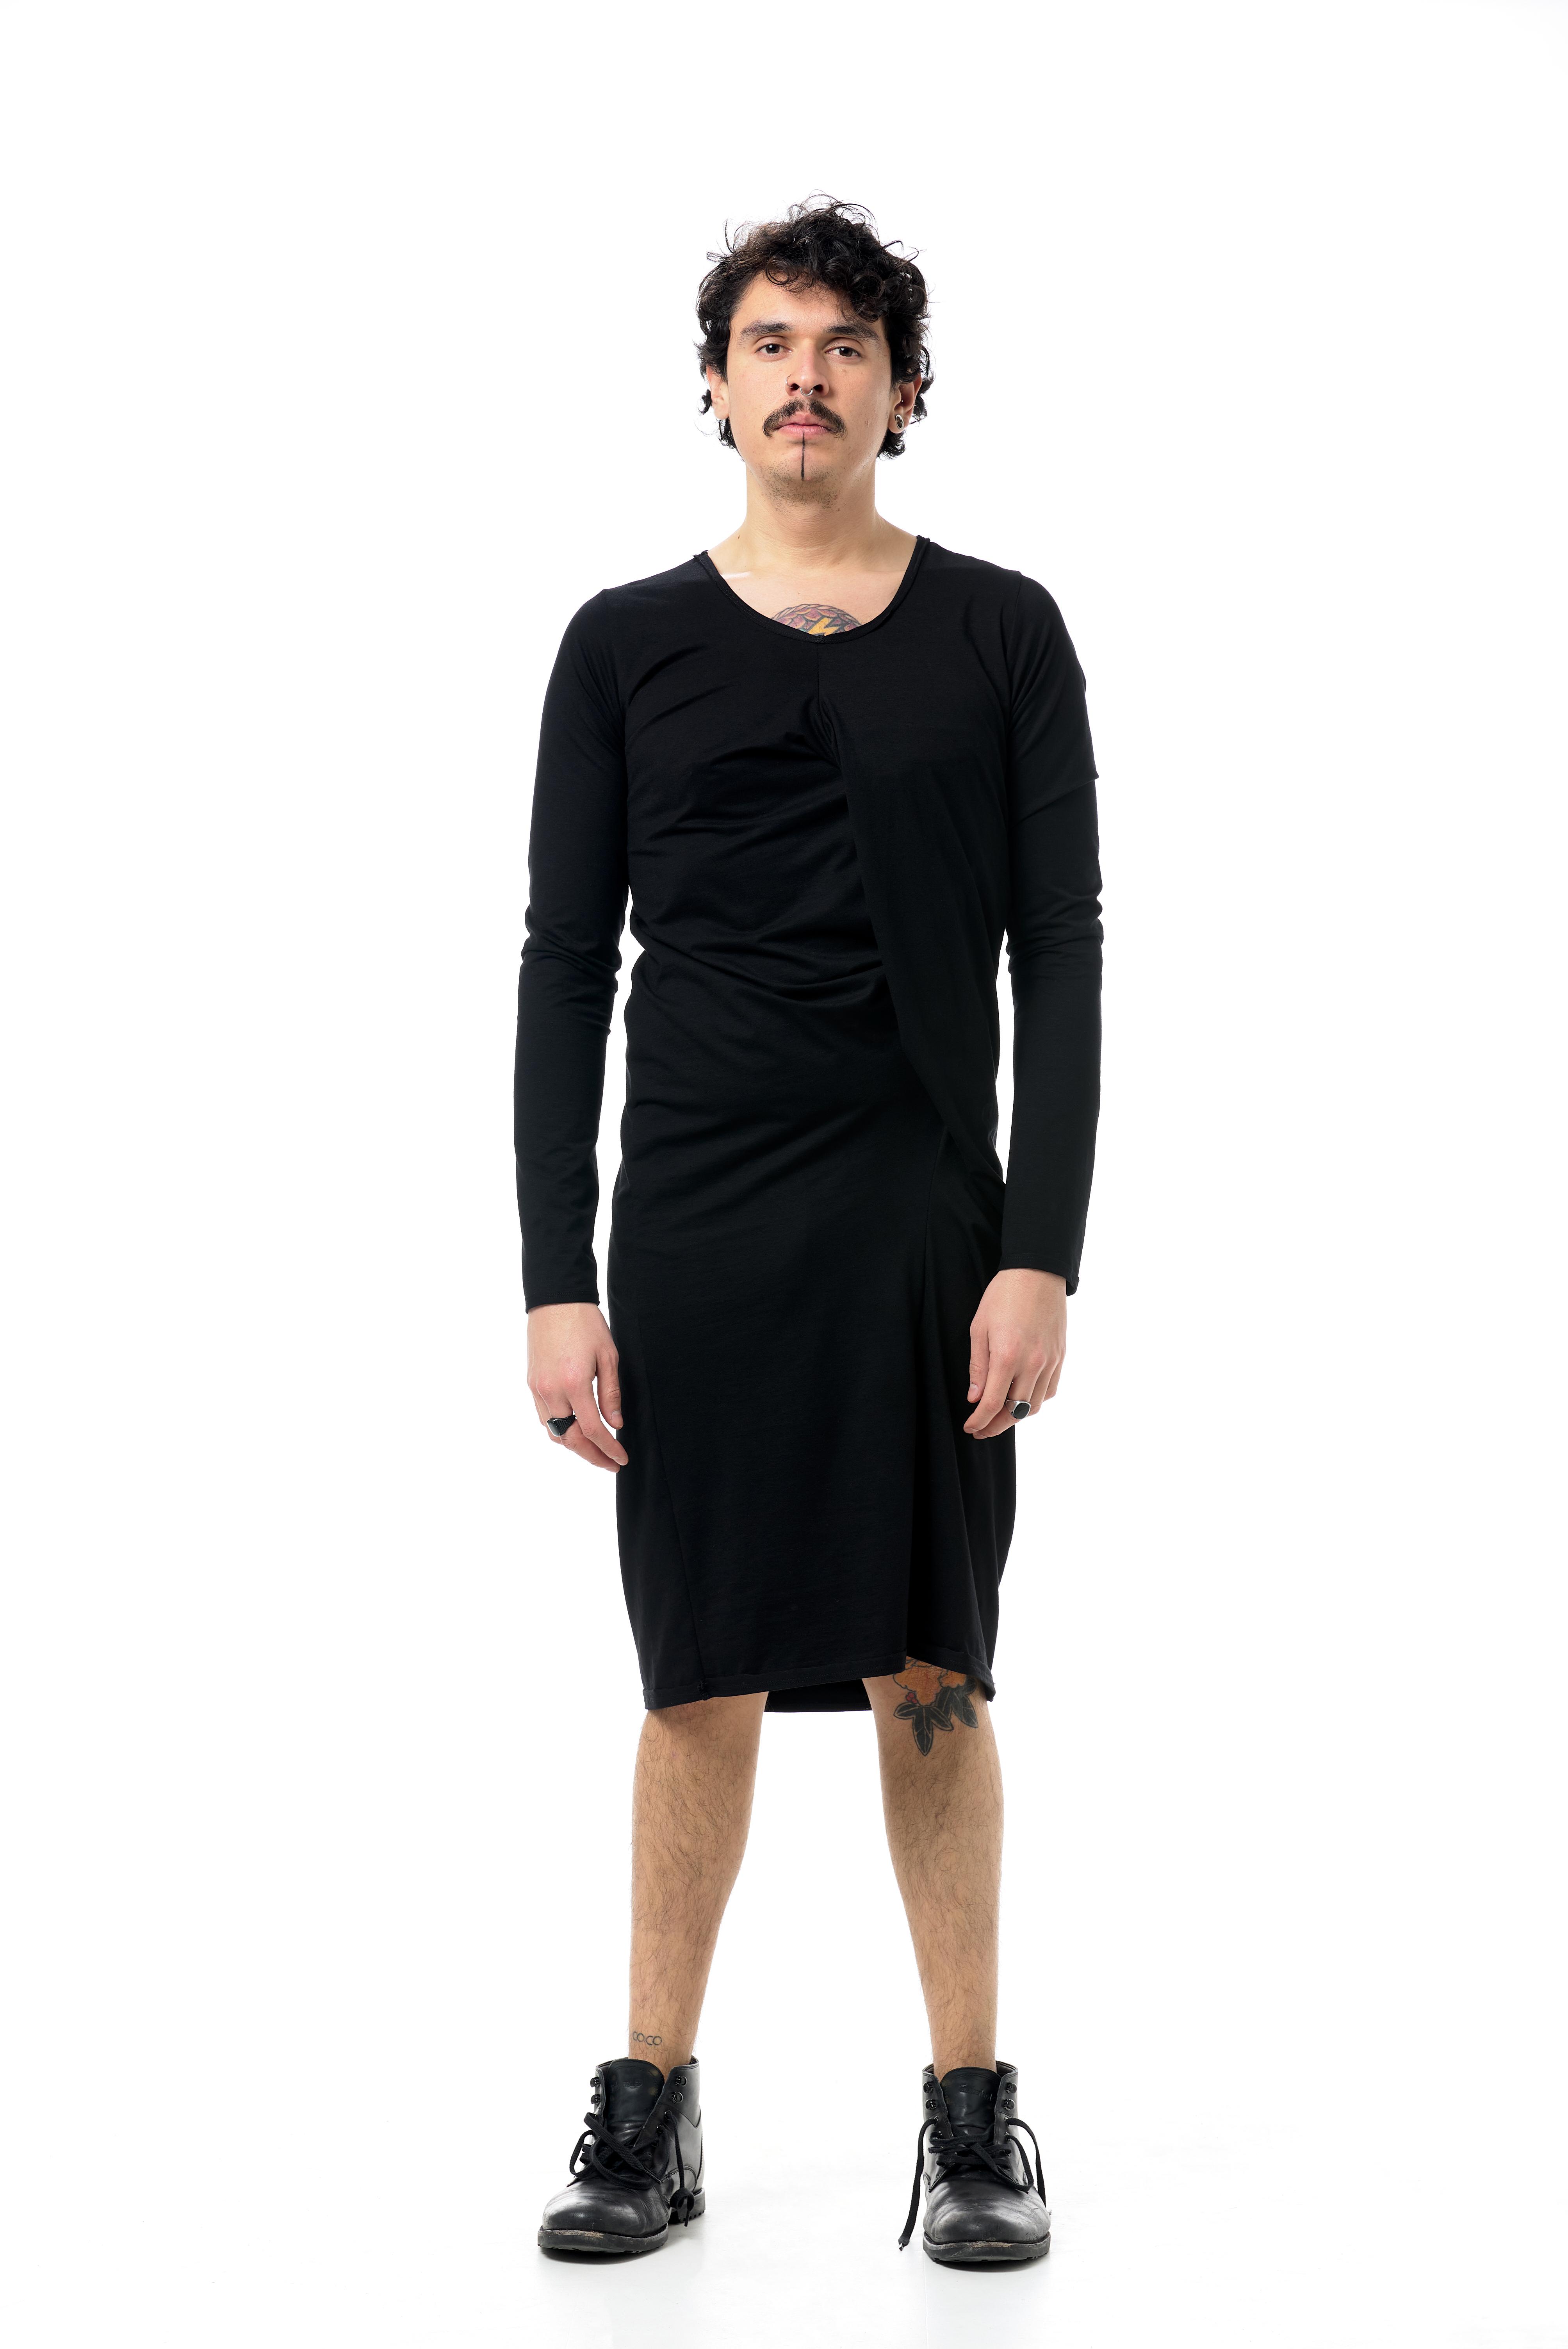 B P DRESS